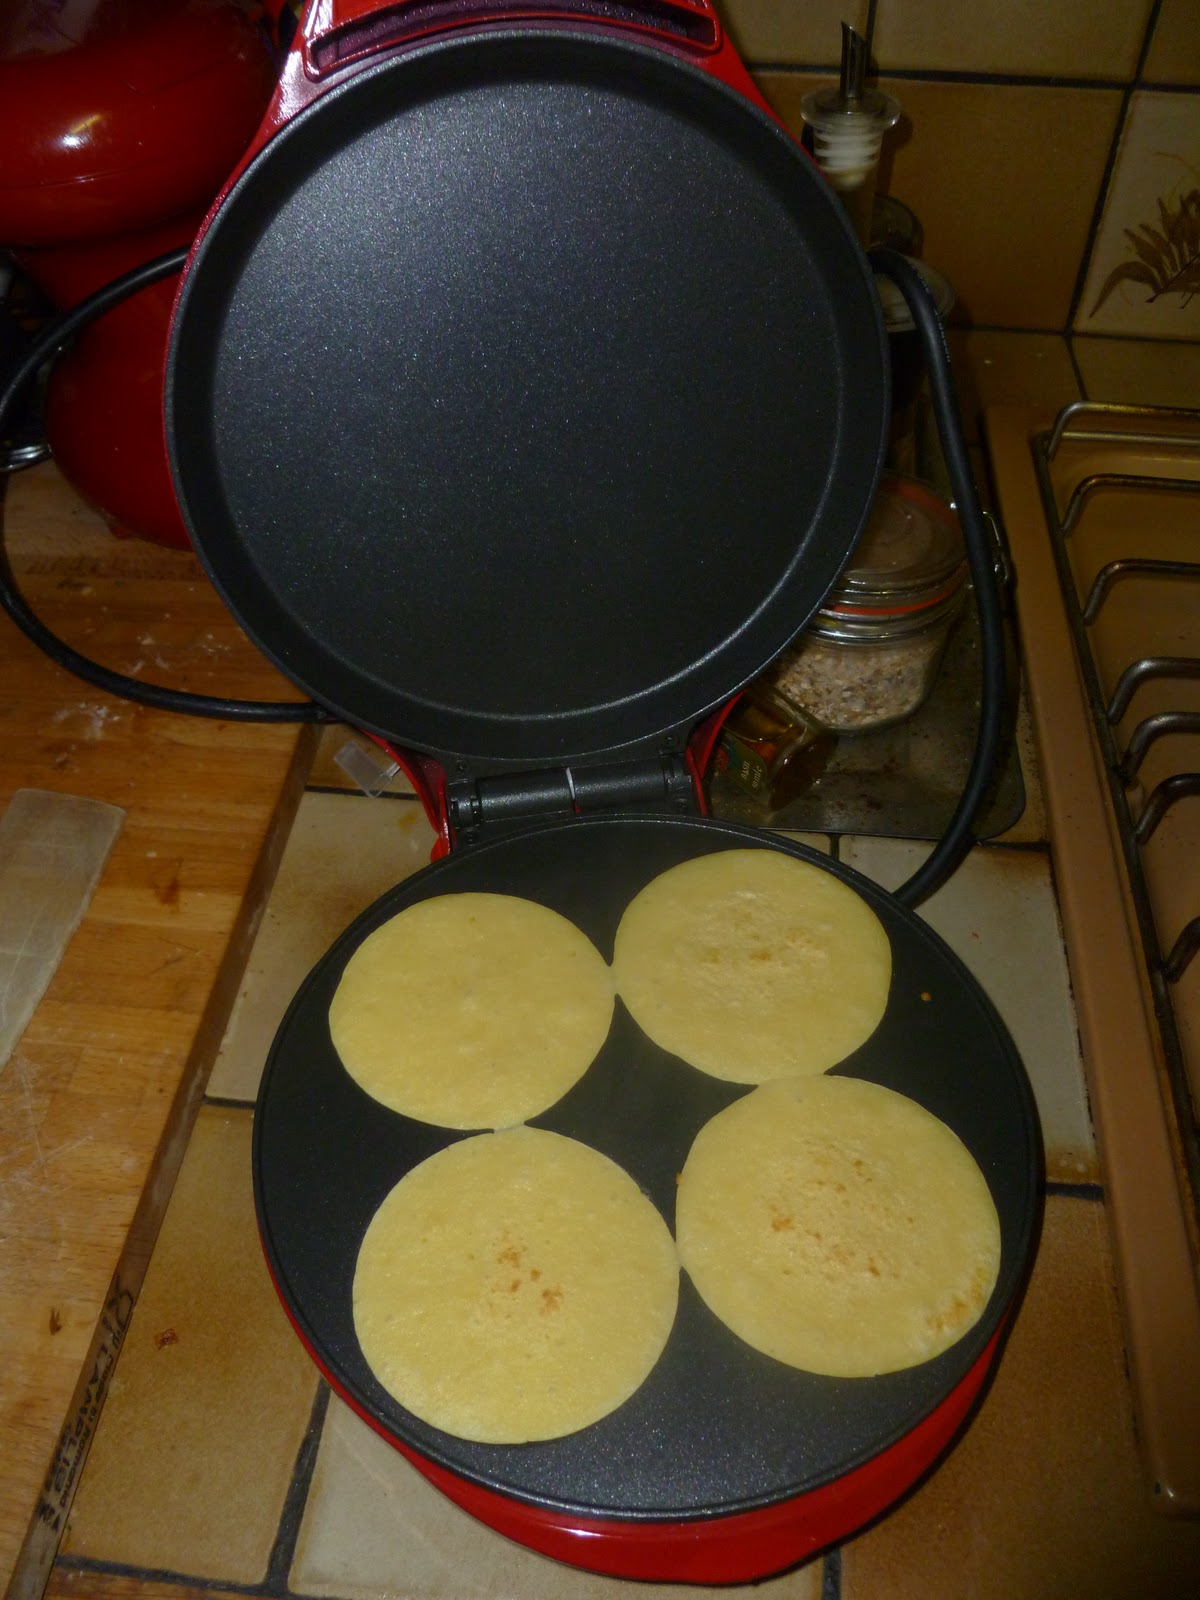 Madhouse Family Reviews Sweet Treats Smiley Pancake Maker